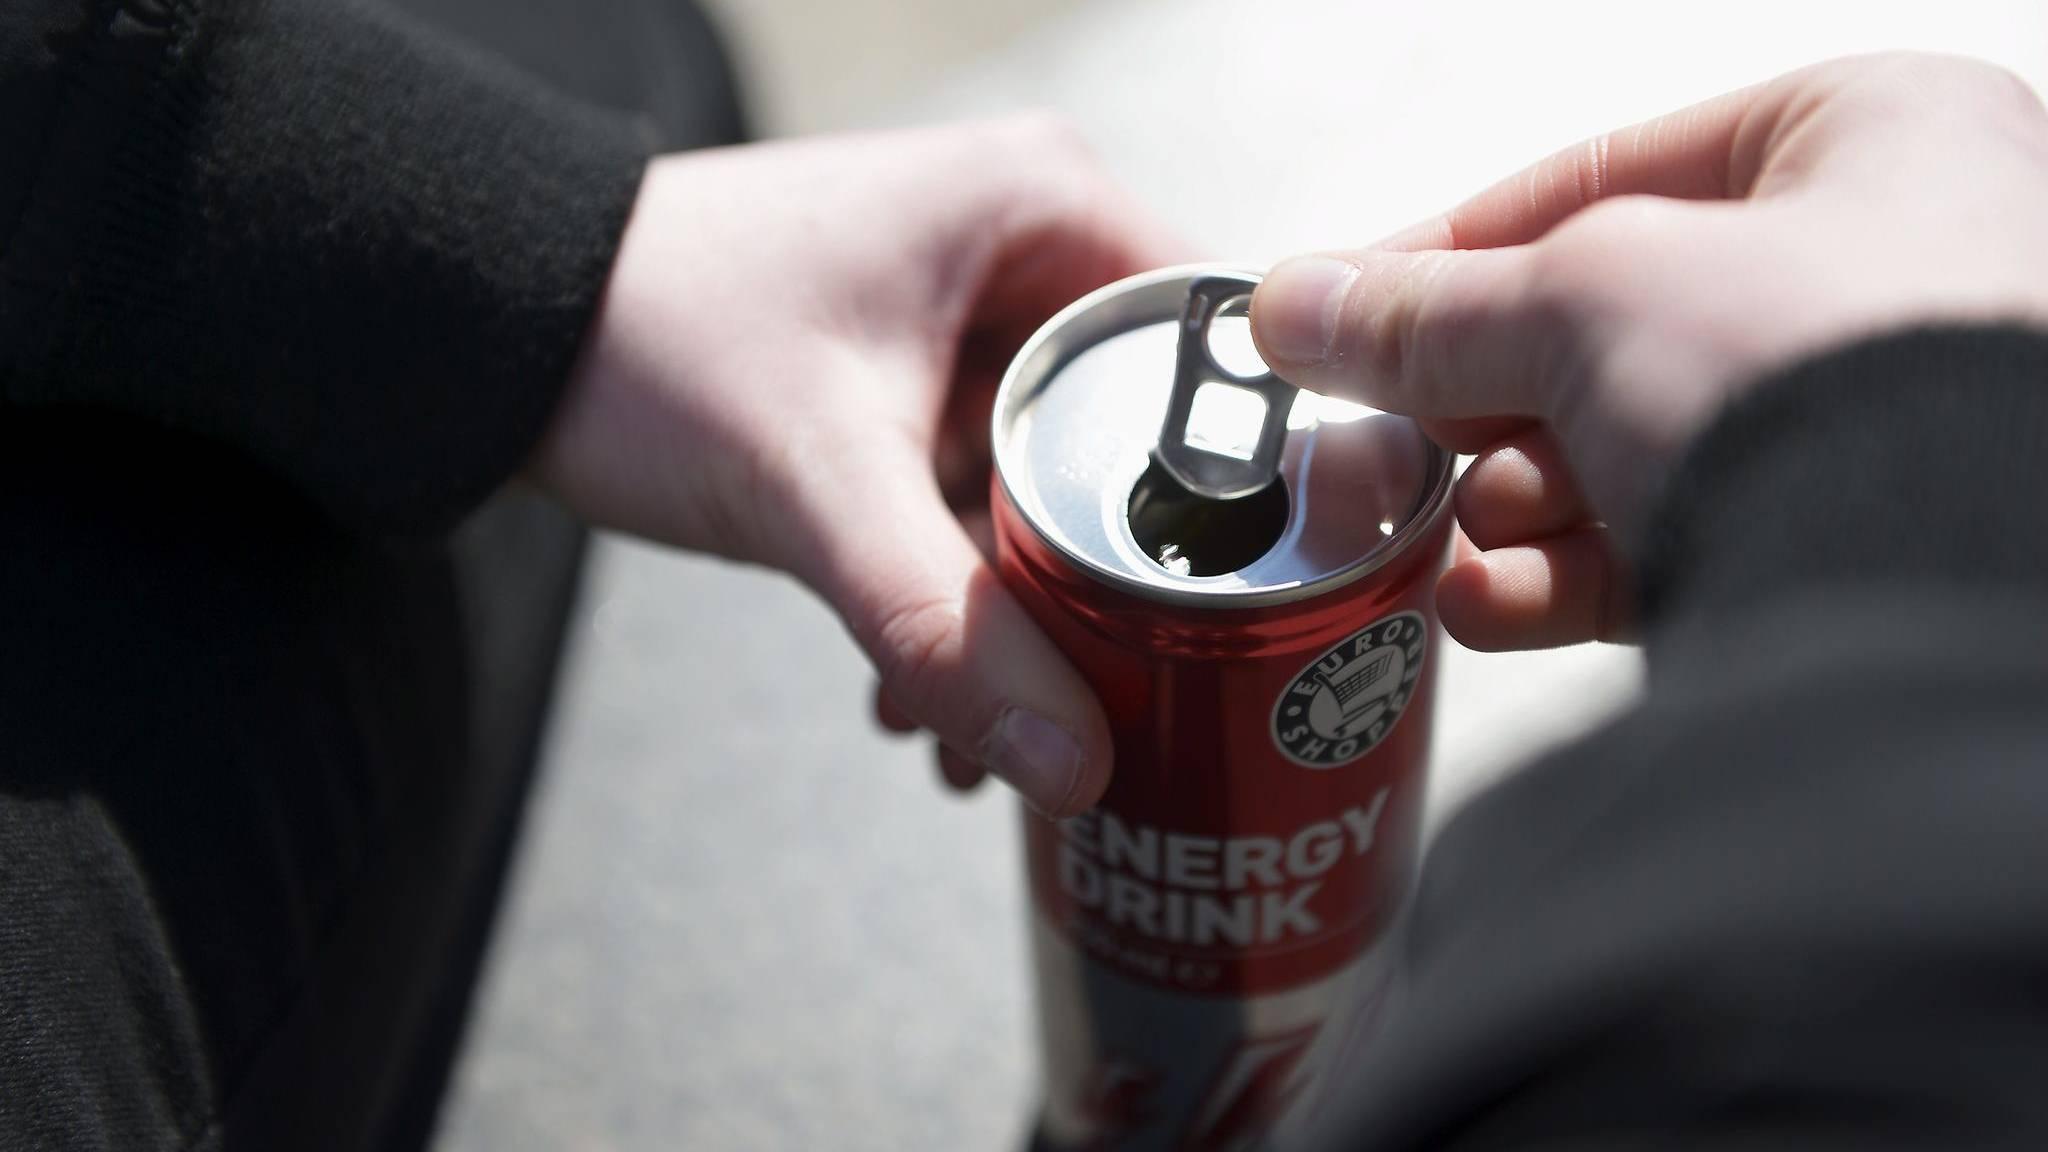 Ab wann darf man energy drinks kaufen | Jugendschutz: Ab ...